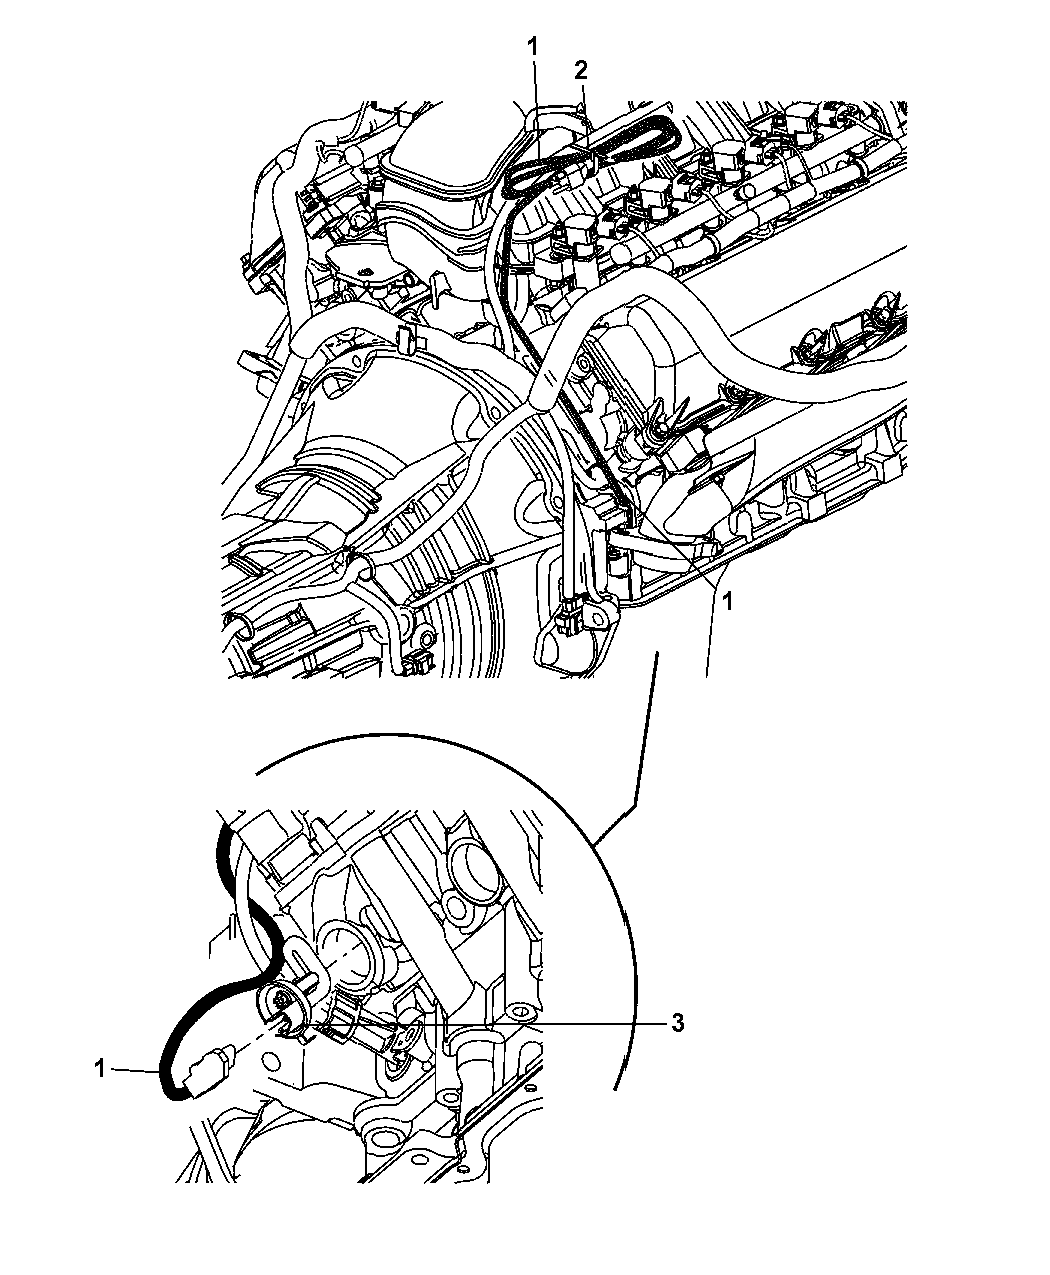 2011 Ram 1500 Engine Cylinder Block Heater - Thumbnail 2